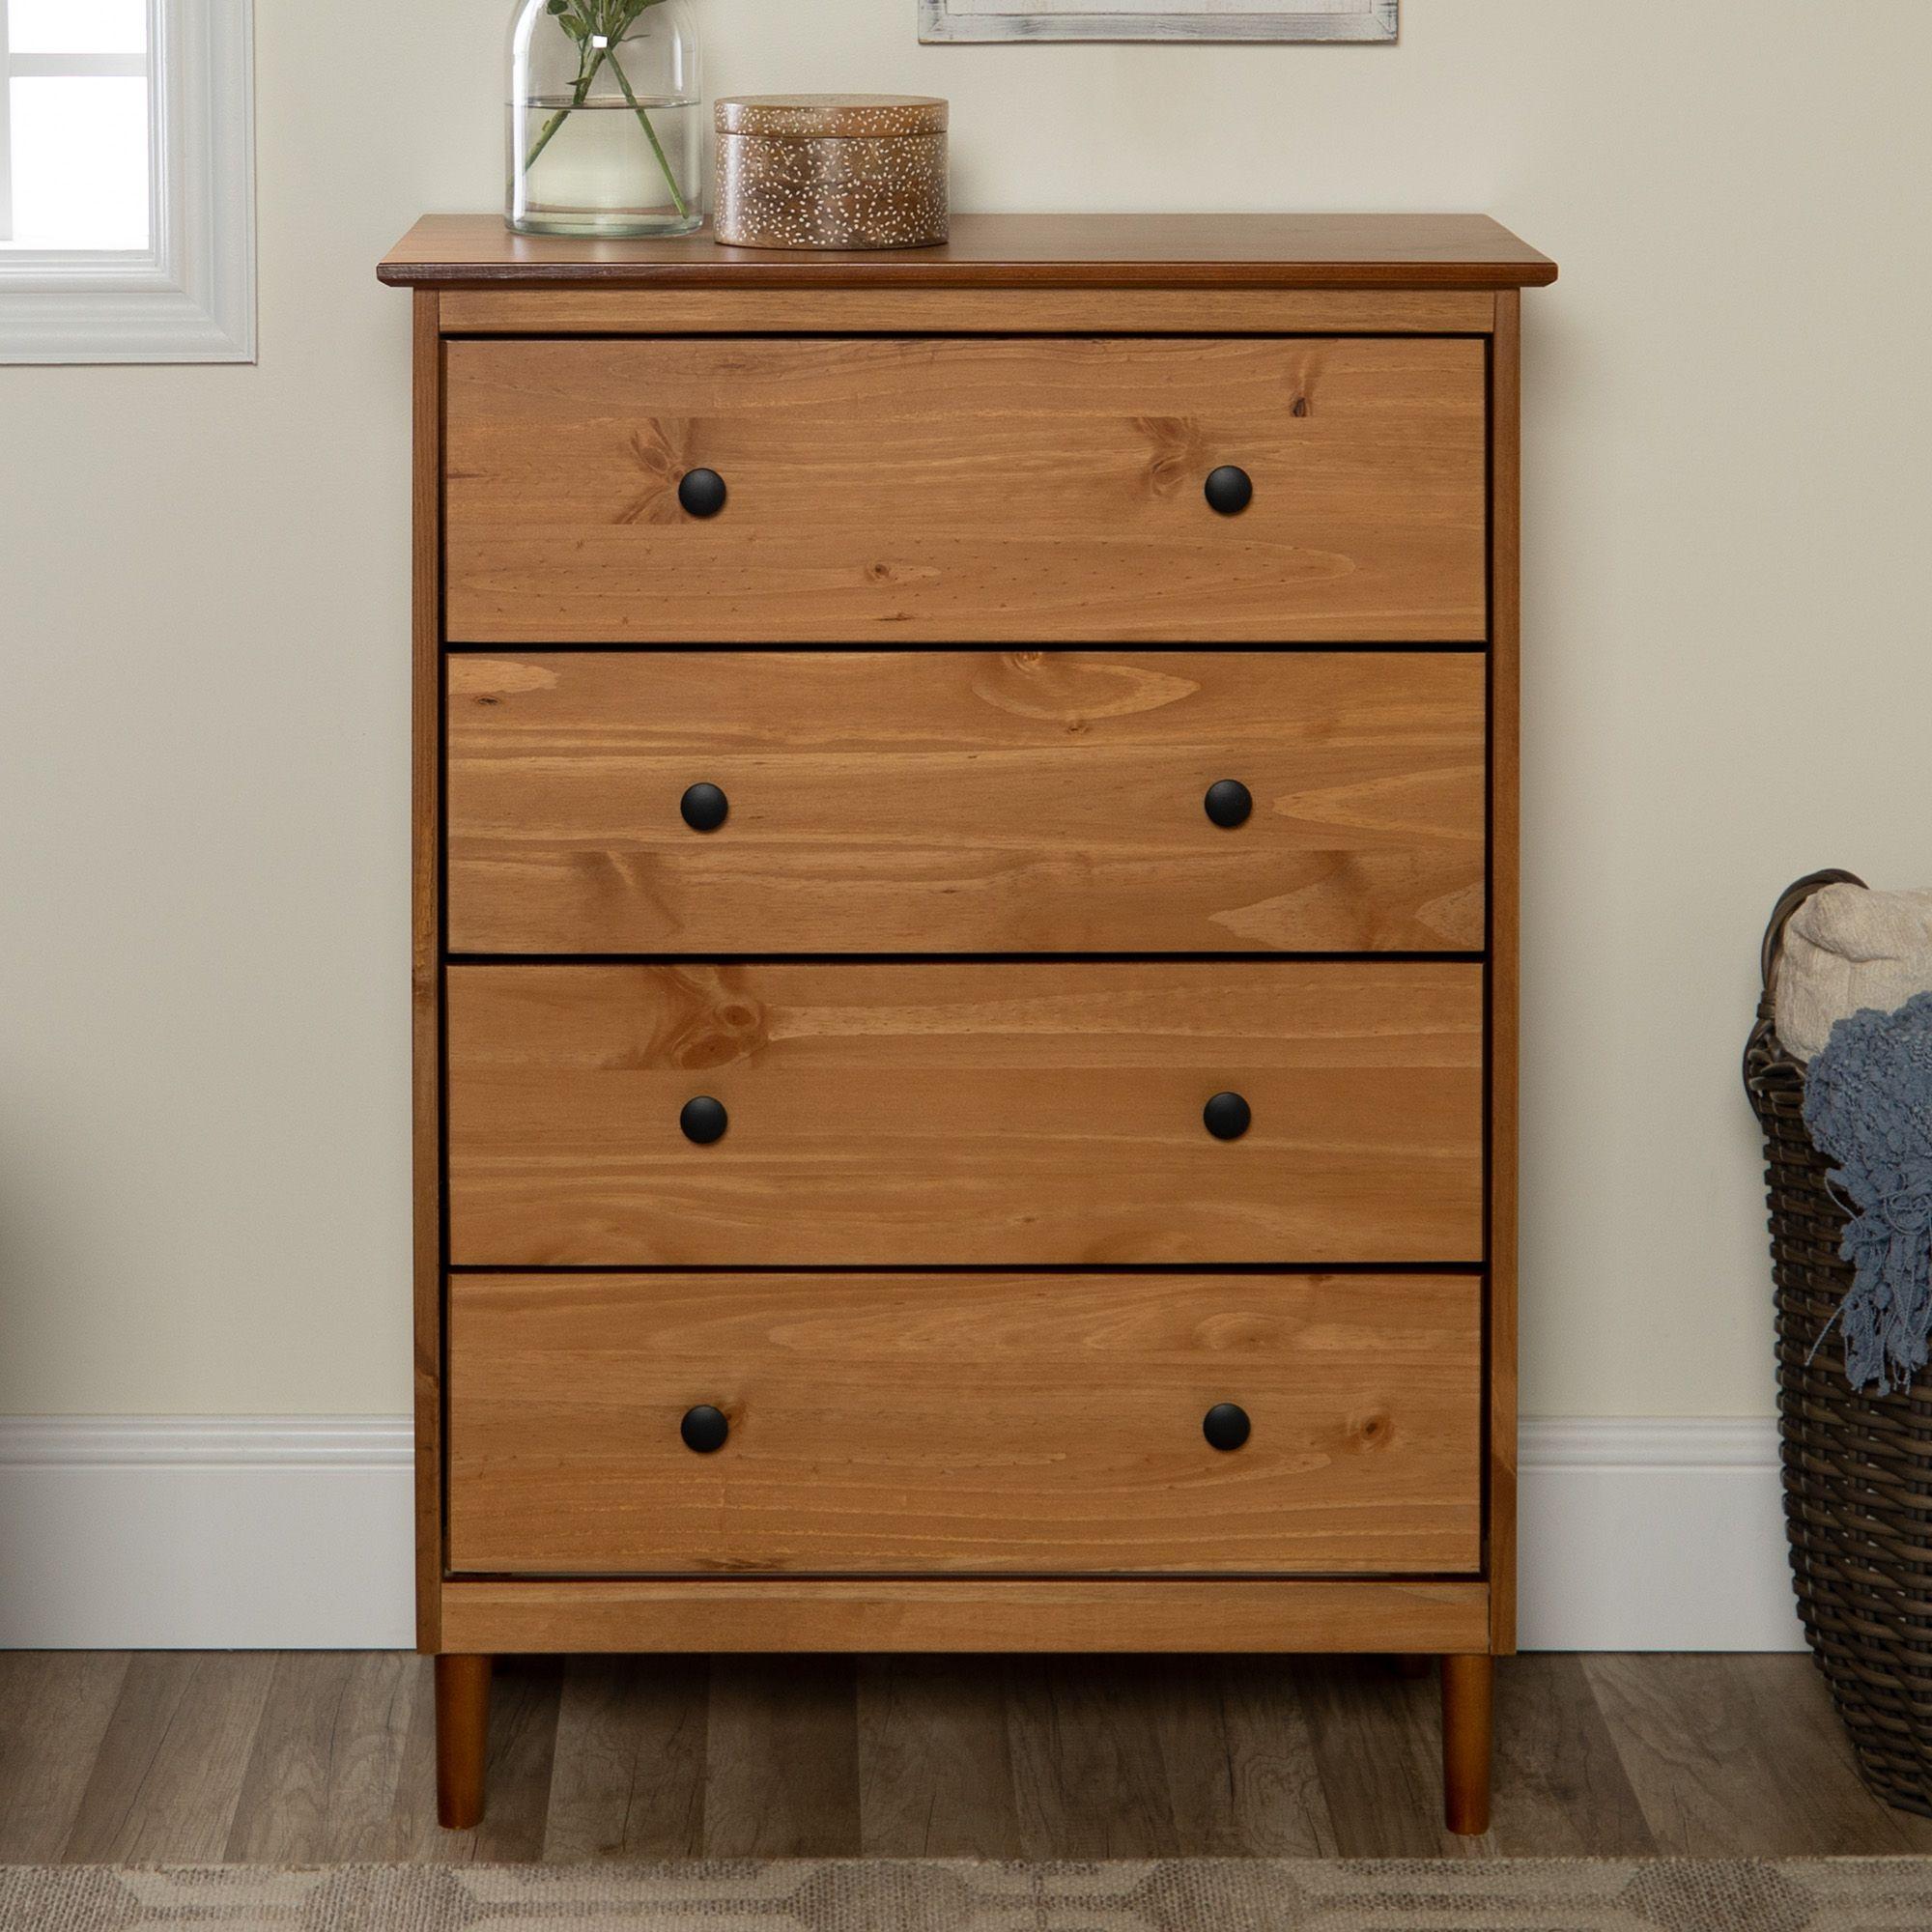 Jules 4 Drawer Solid Wood Caramel Dresser By Bellamy Studios Walmart Com Wood Dresser Solid Wood Dresser Dressers For Sale [ 2000 x 2000 Pixel ]